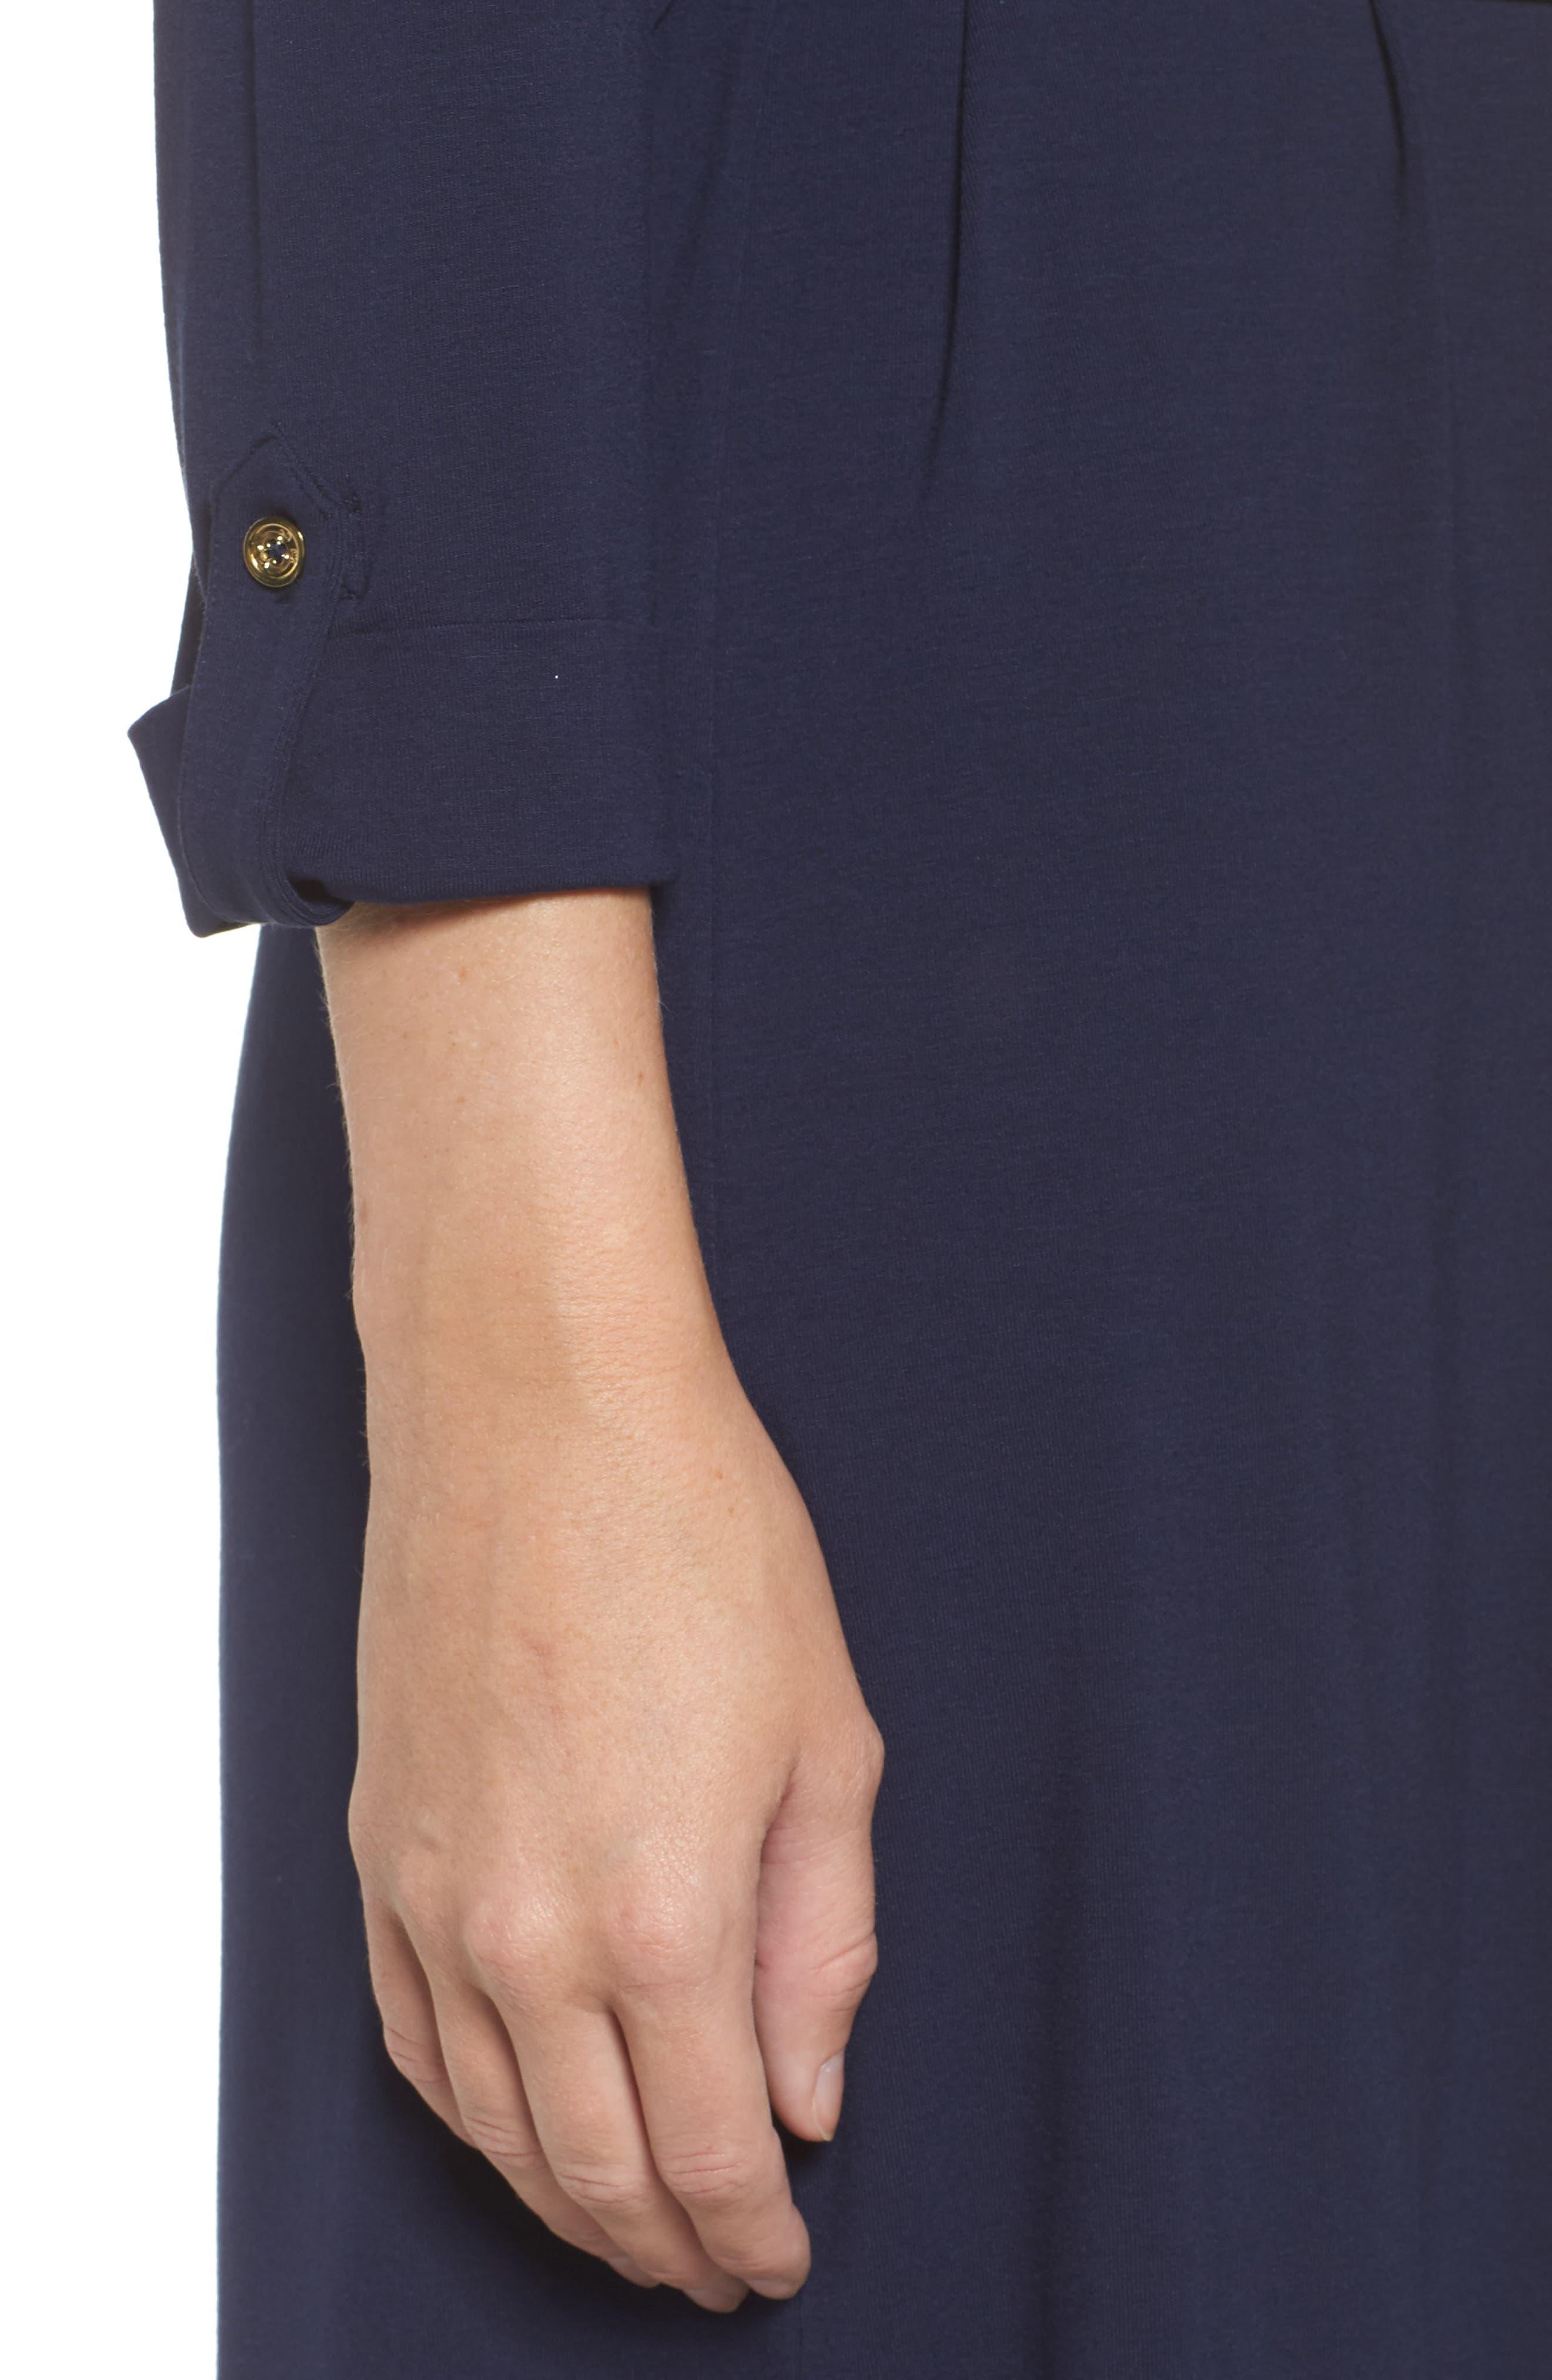 Bailor Shirtdress,                             Alternate thumbnail 4, color,